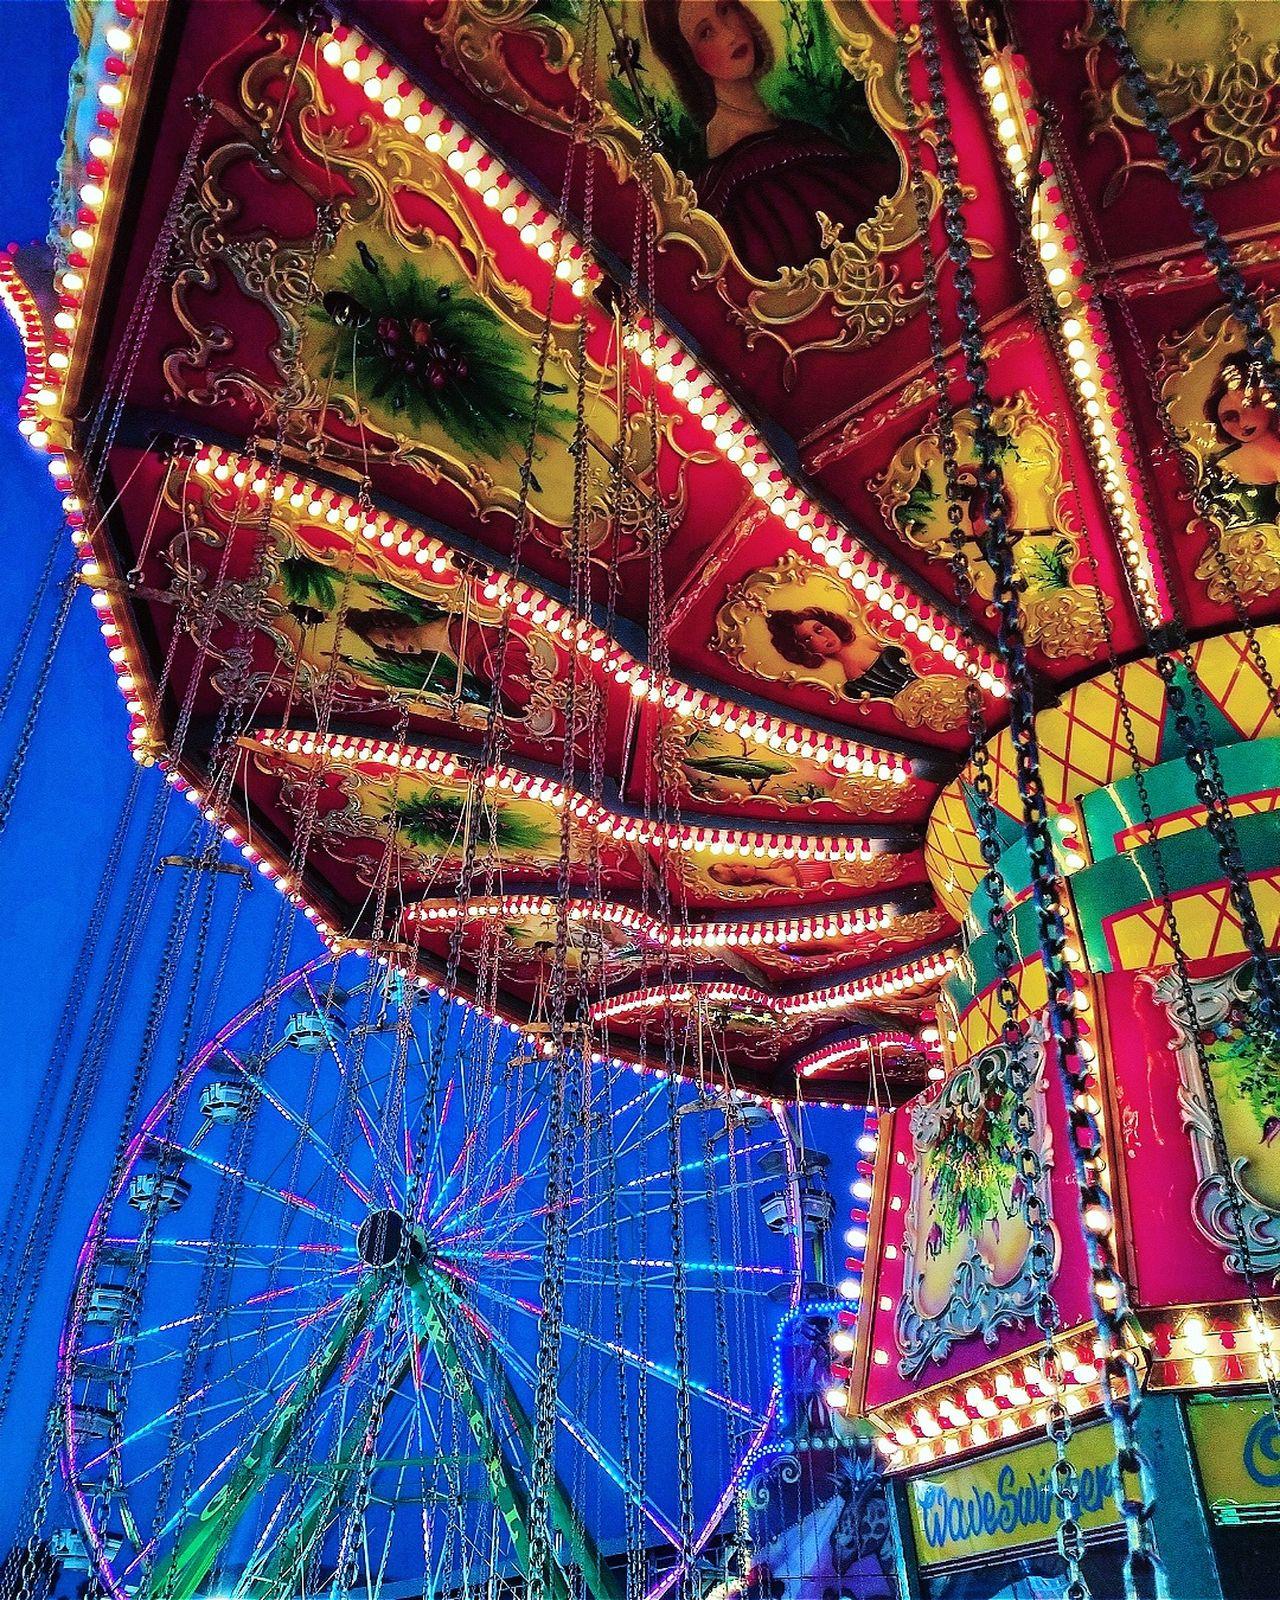 Fair Play Low Angle View Fair Ferris Wheel Carnival State Fair County Fair Swings Rides Lights Multi Colored Looking Up Night Photography BestEyeemShots BestofEyeEm EyeEmBestEdits EyeEm Masterclass EyeEm Vision Premium Collection EyeEm Best Shots